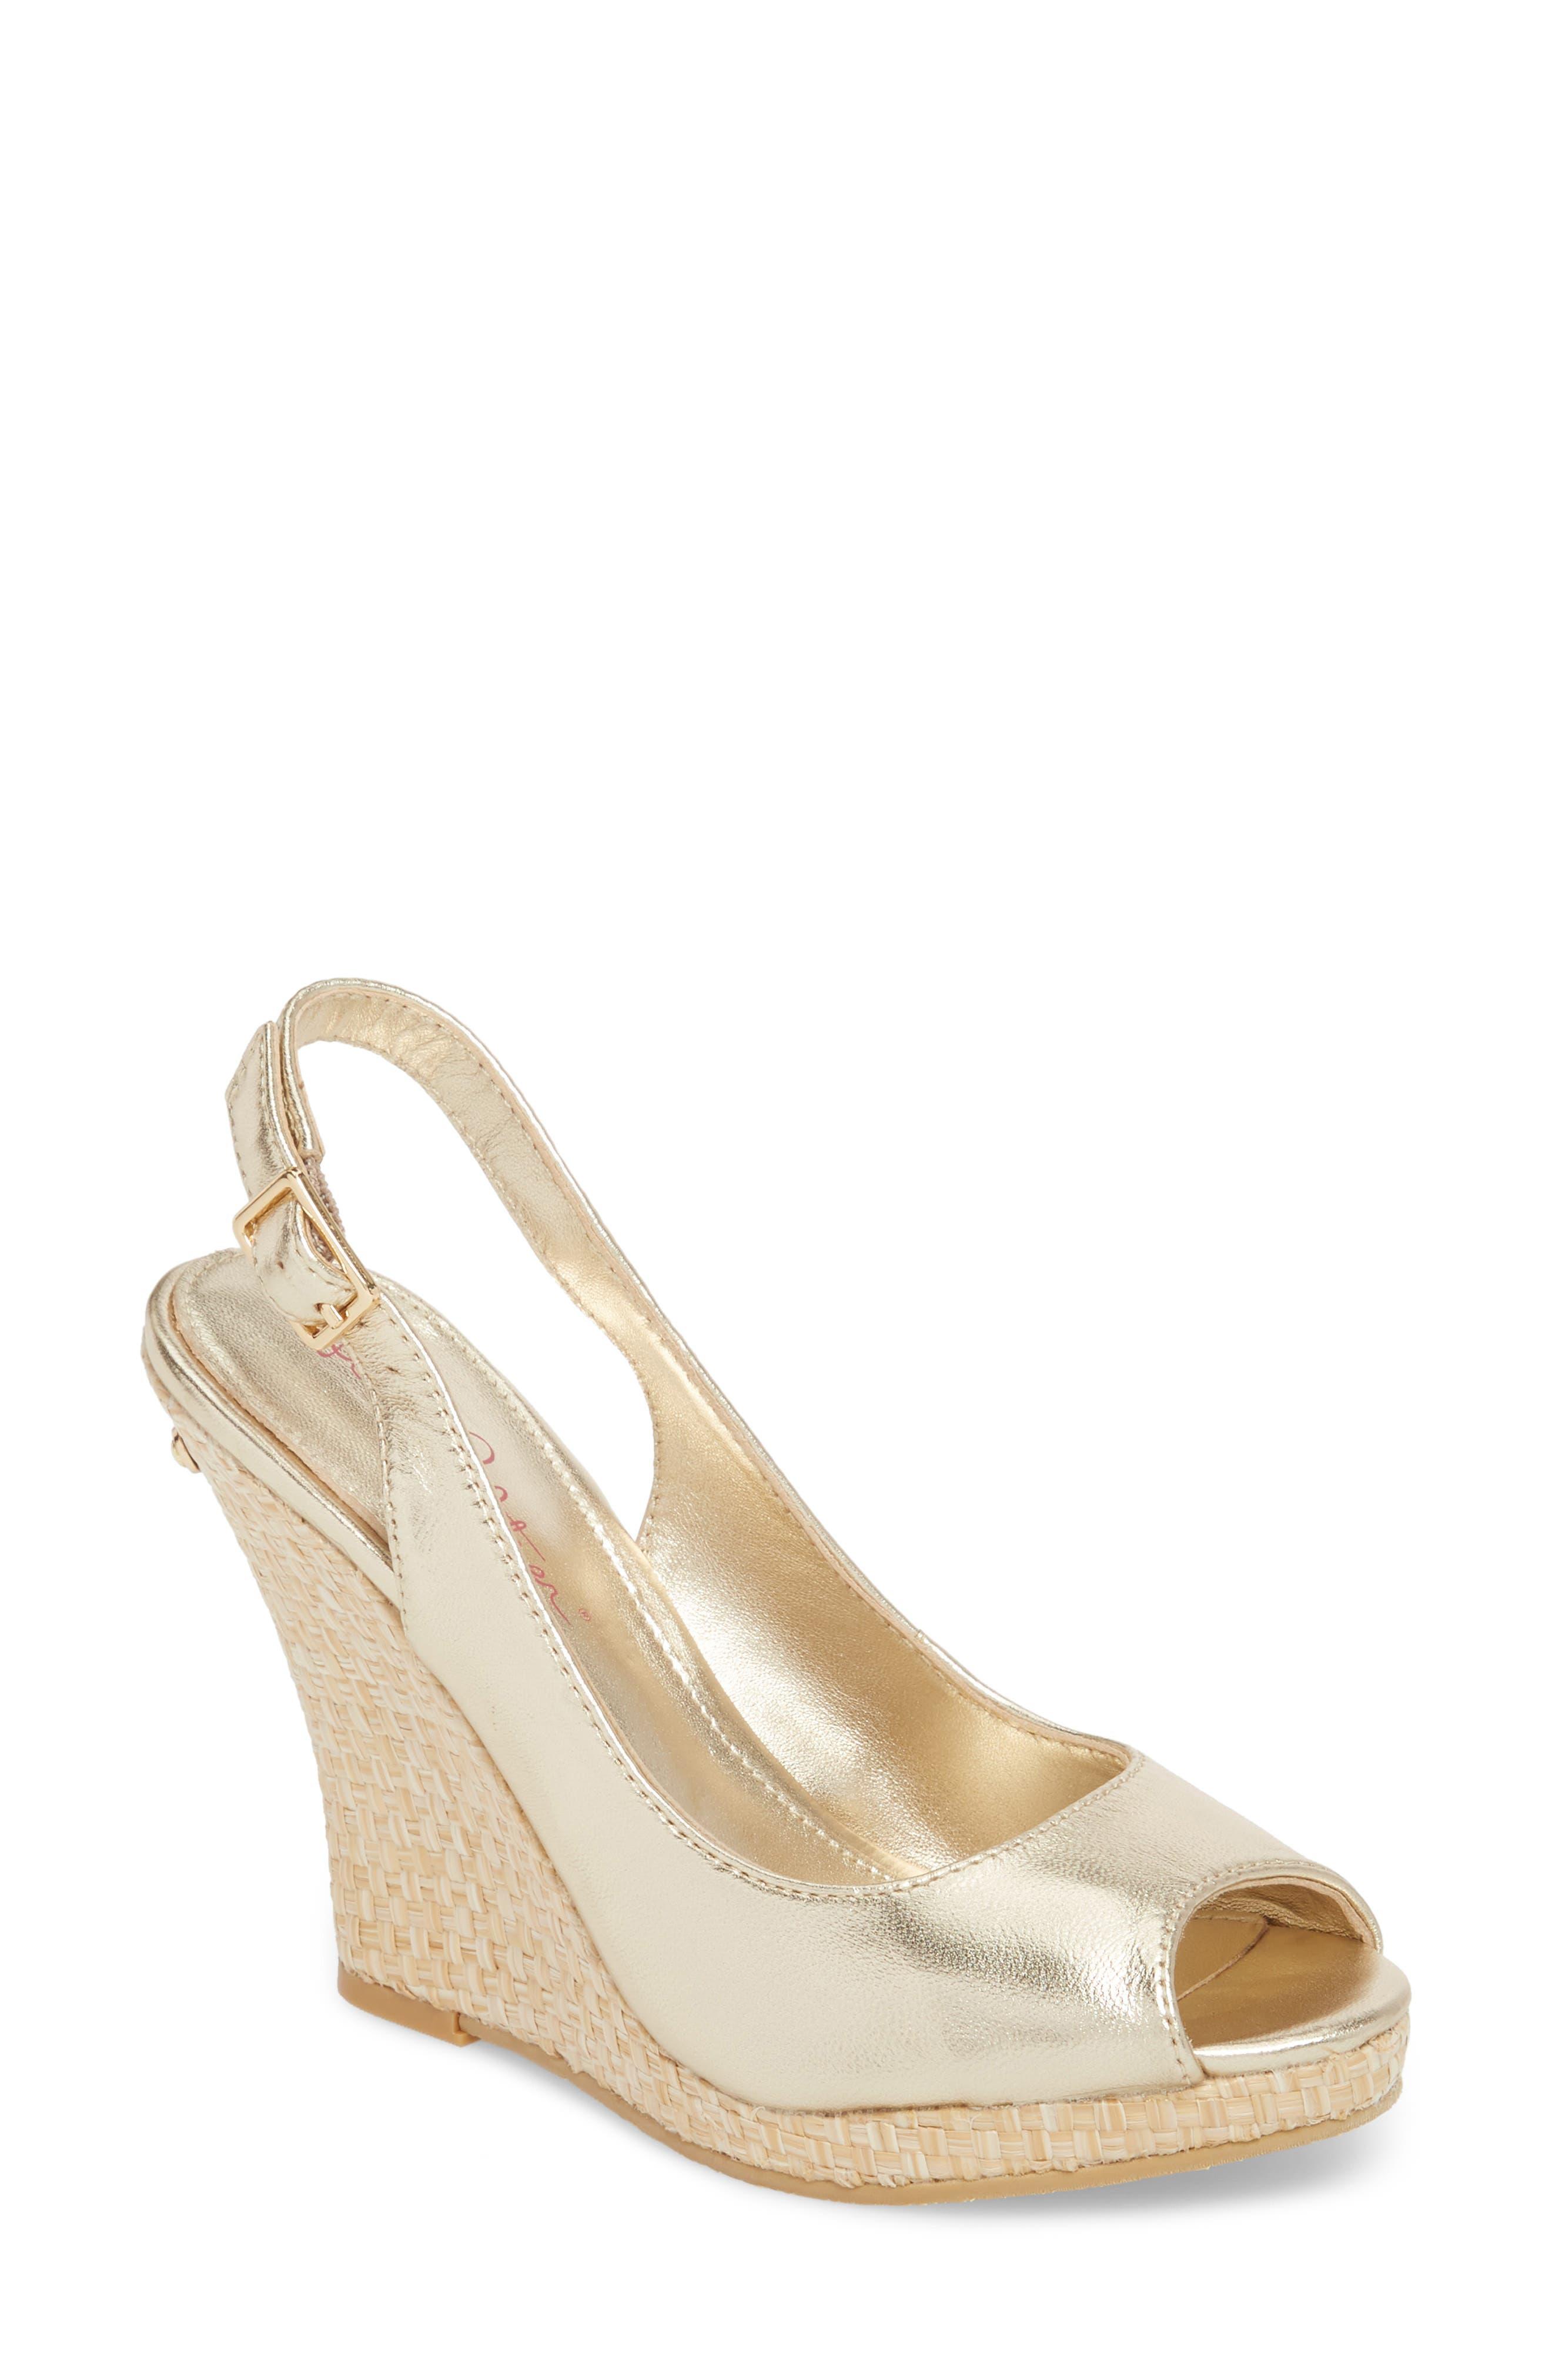 Kristin Slingback Wedge Sandal,                         Main,                         color, GOLD METALLIC LEATHER